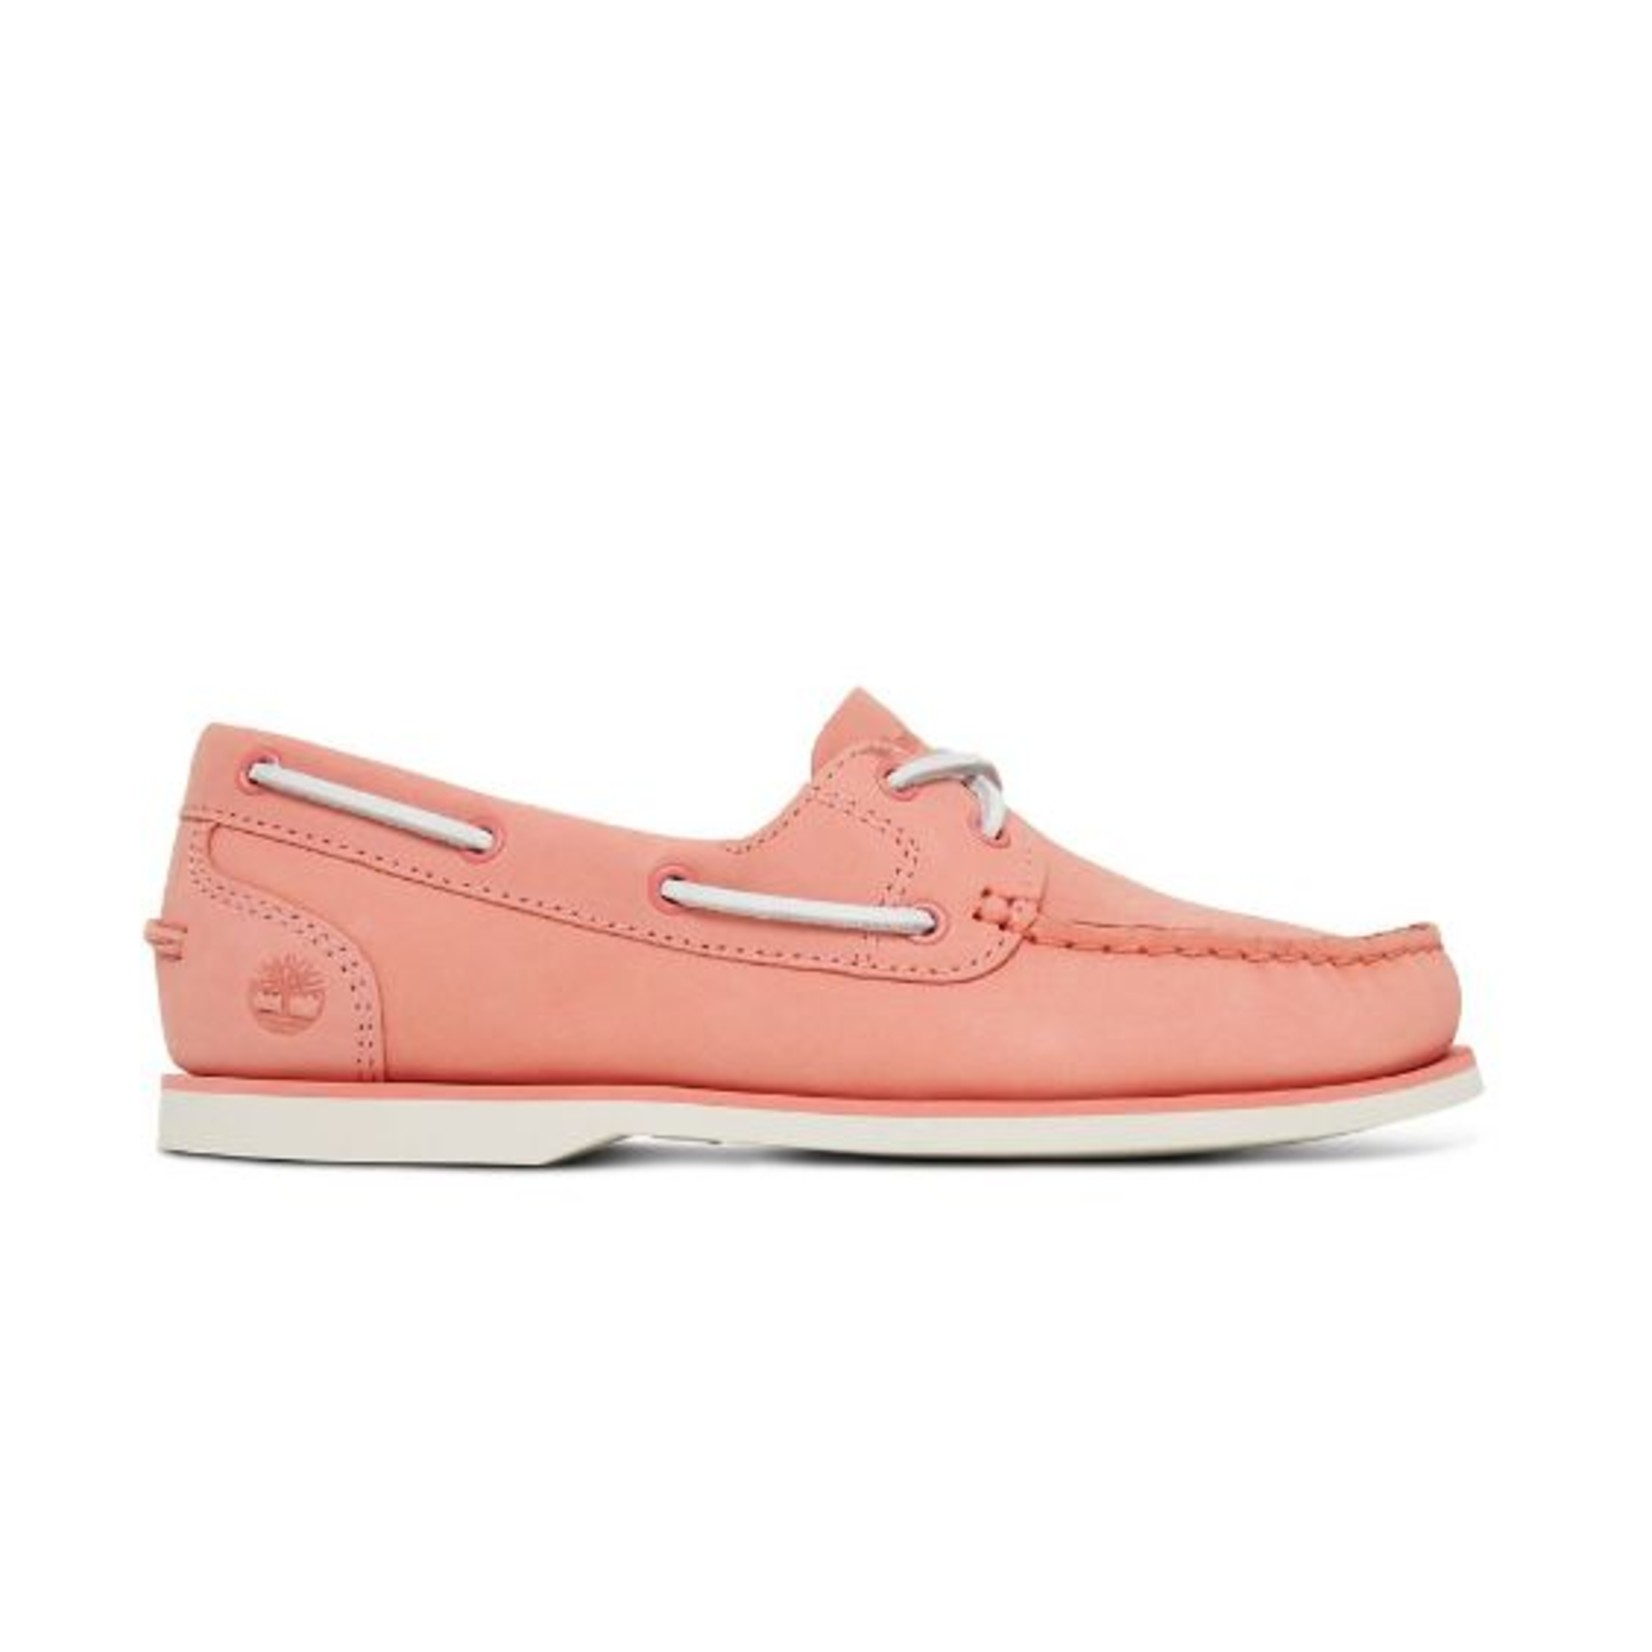 Timberland Womens Classic Boat Shoe Pink